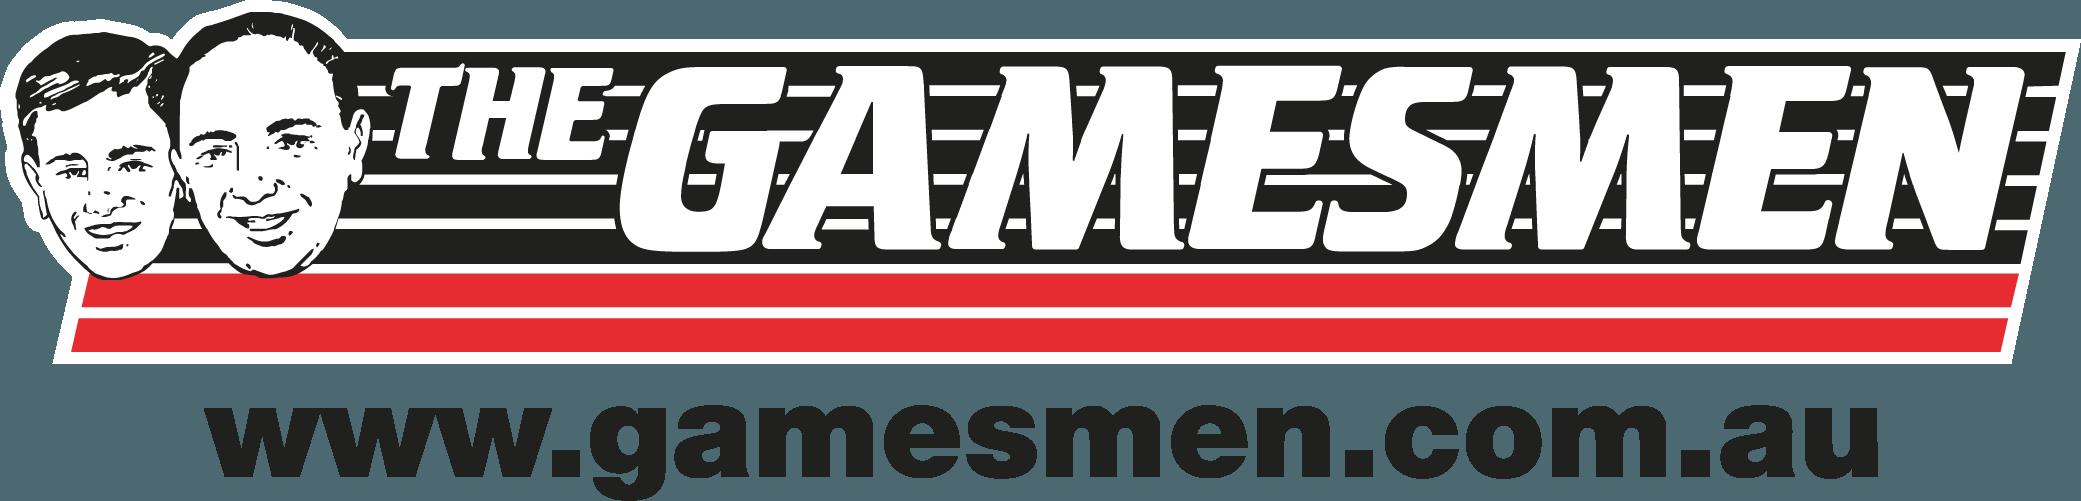 Gamesmen_Hi-Res_logo_w_URL__1_.png